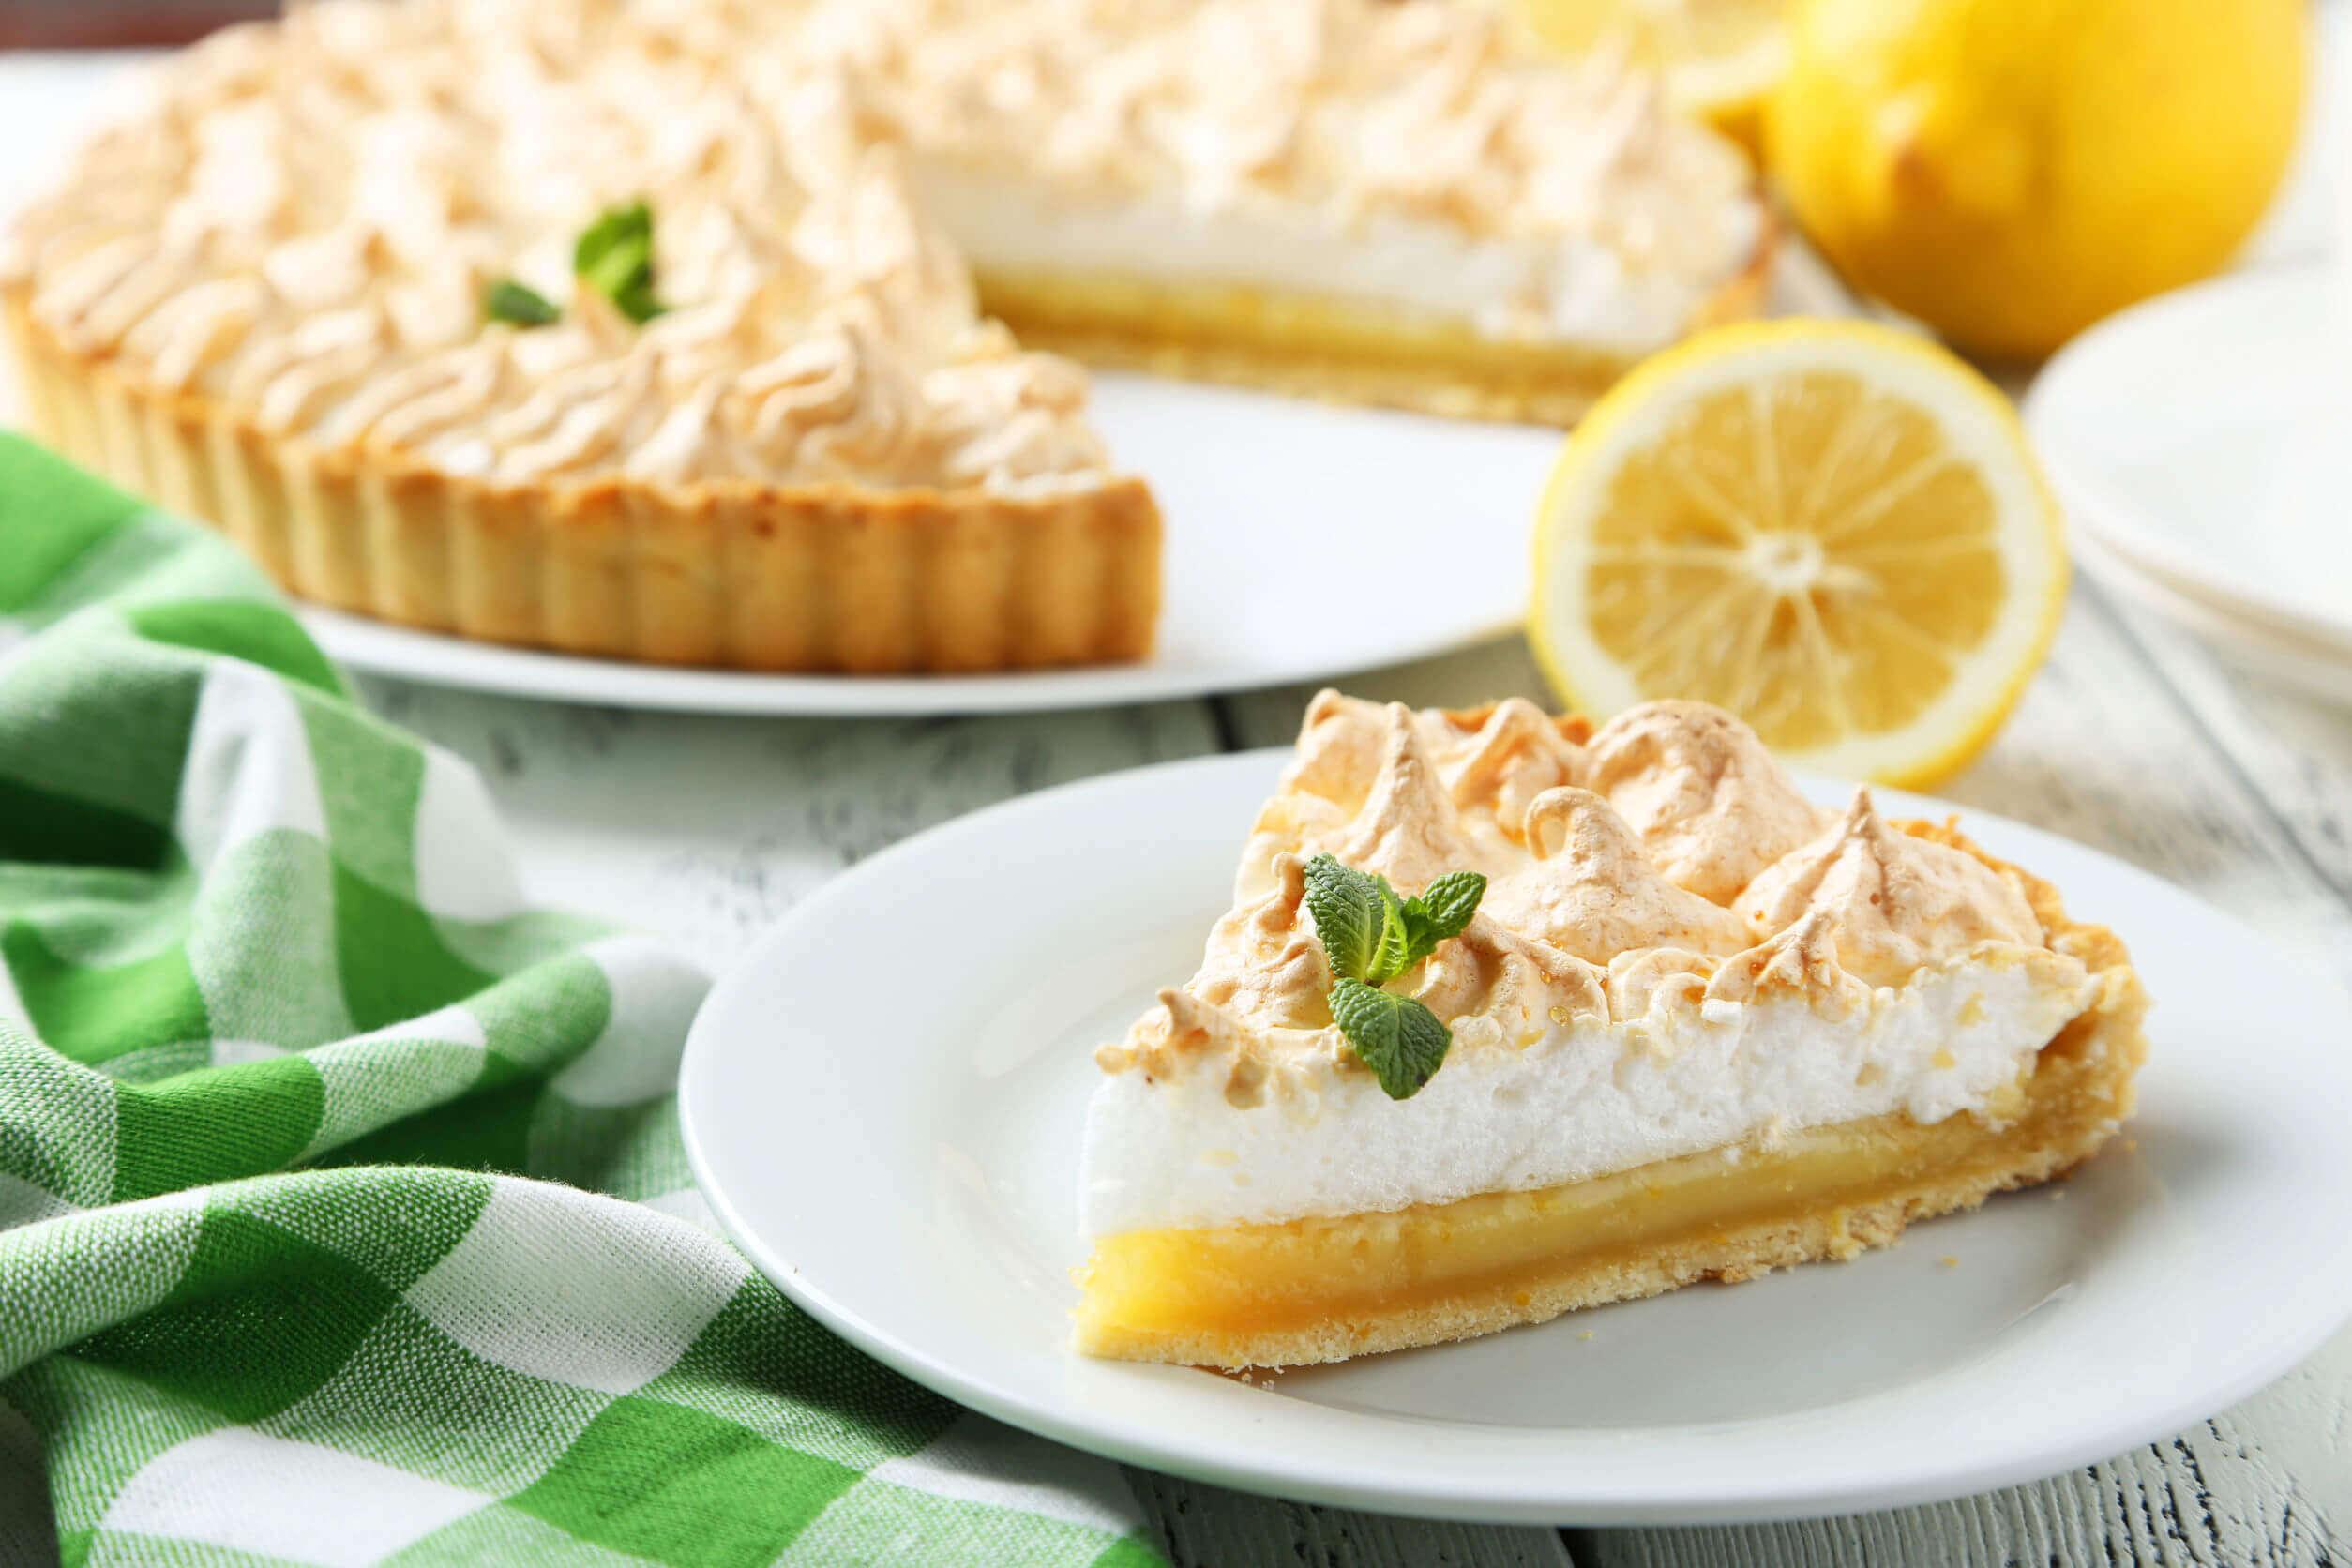 A slice of lemon pie.